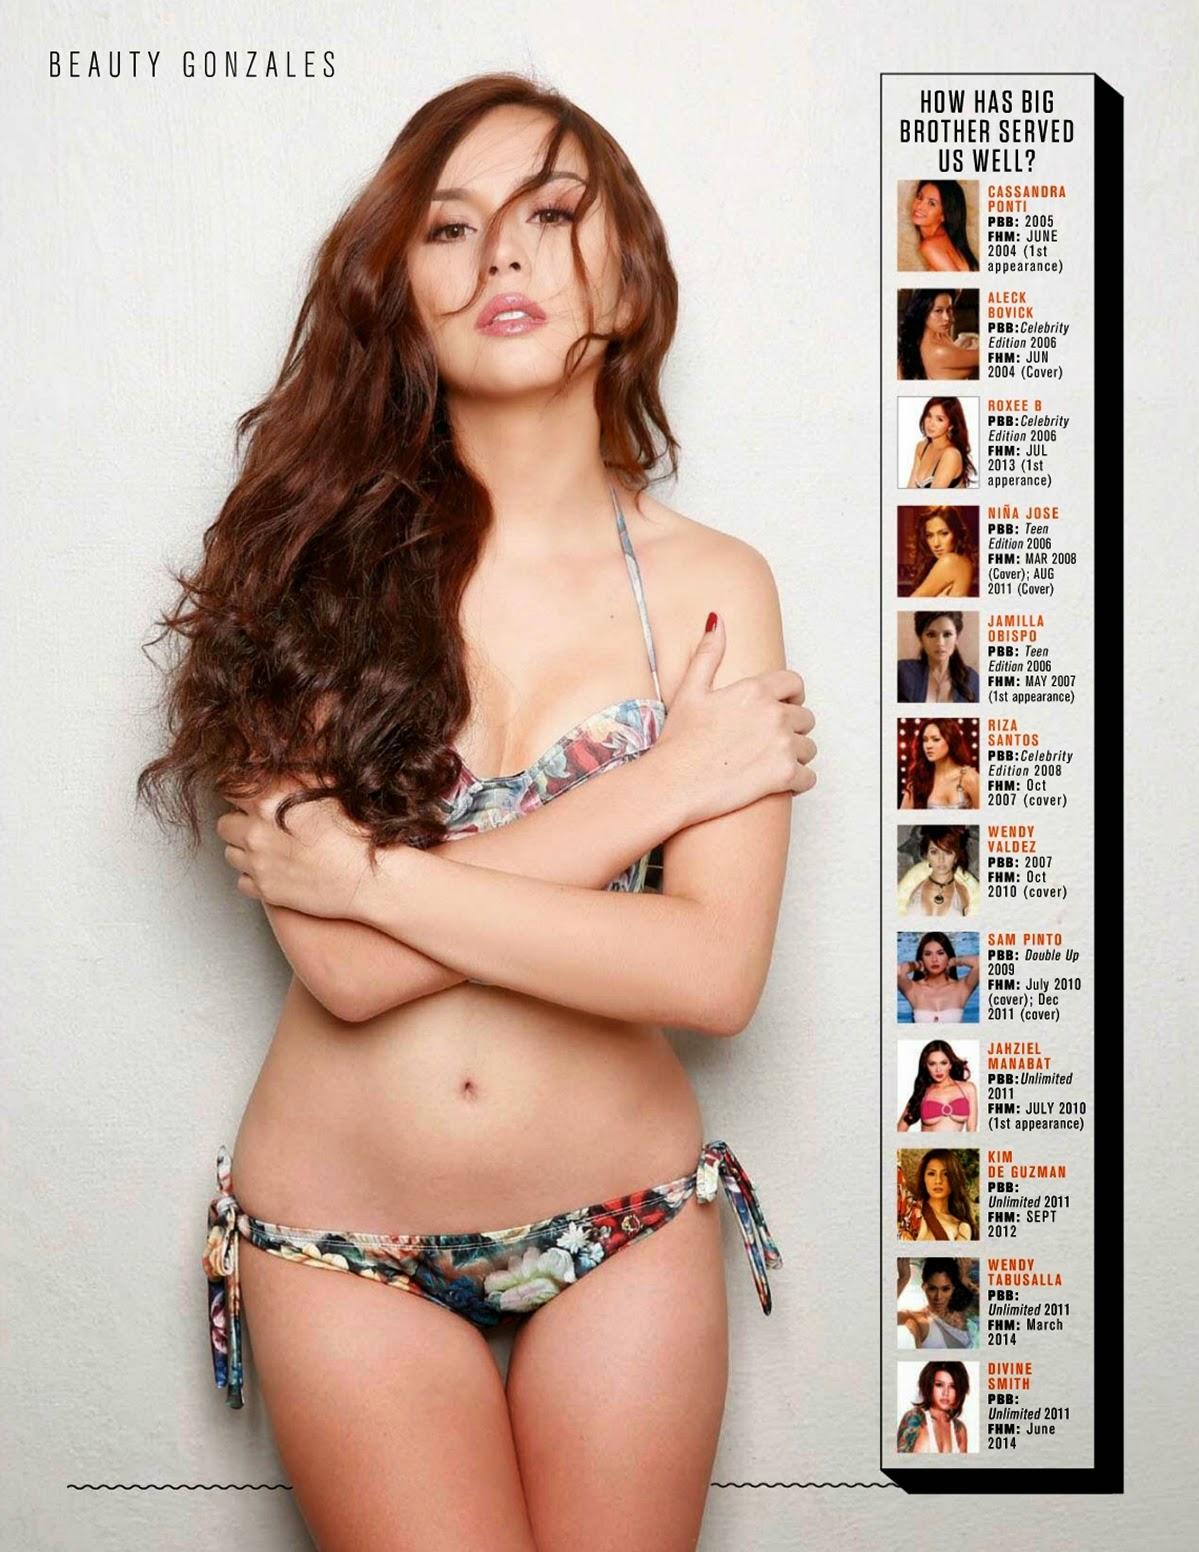 fhm philippines 100 sexiest 2014 pdf